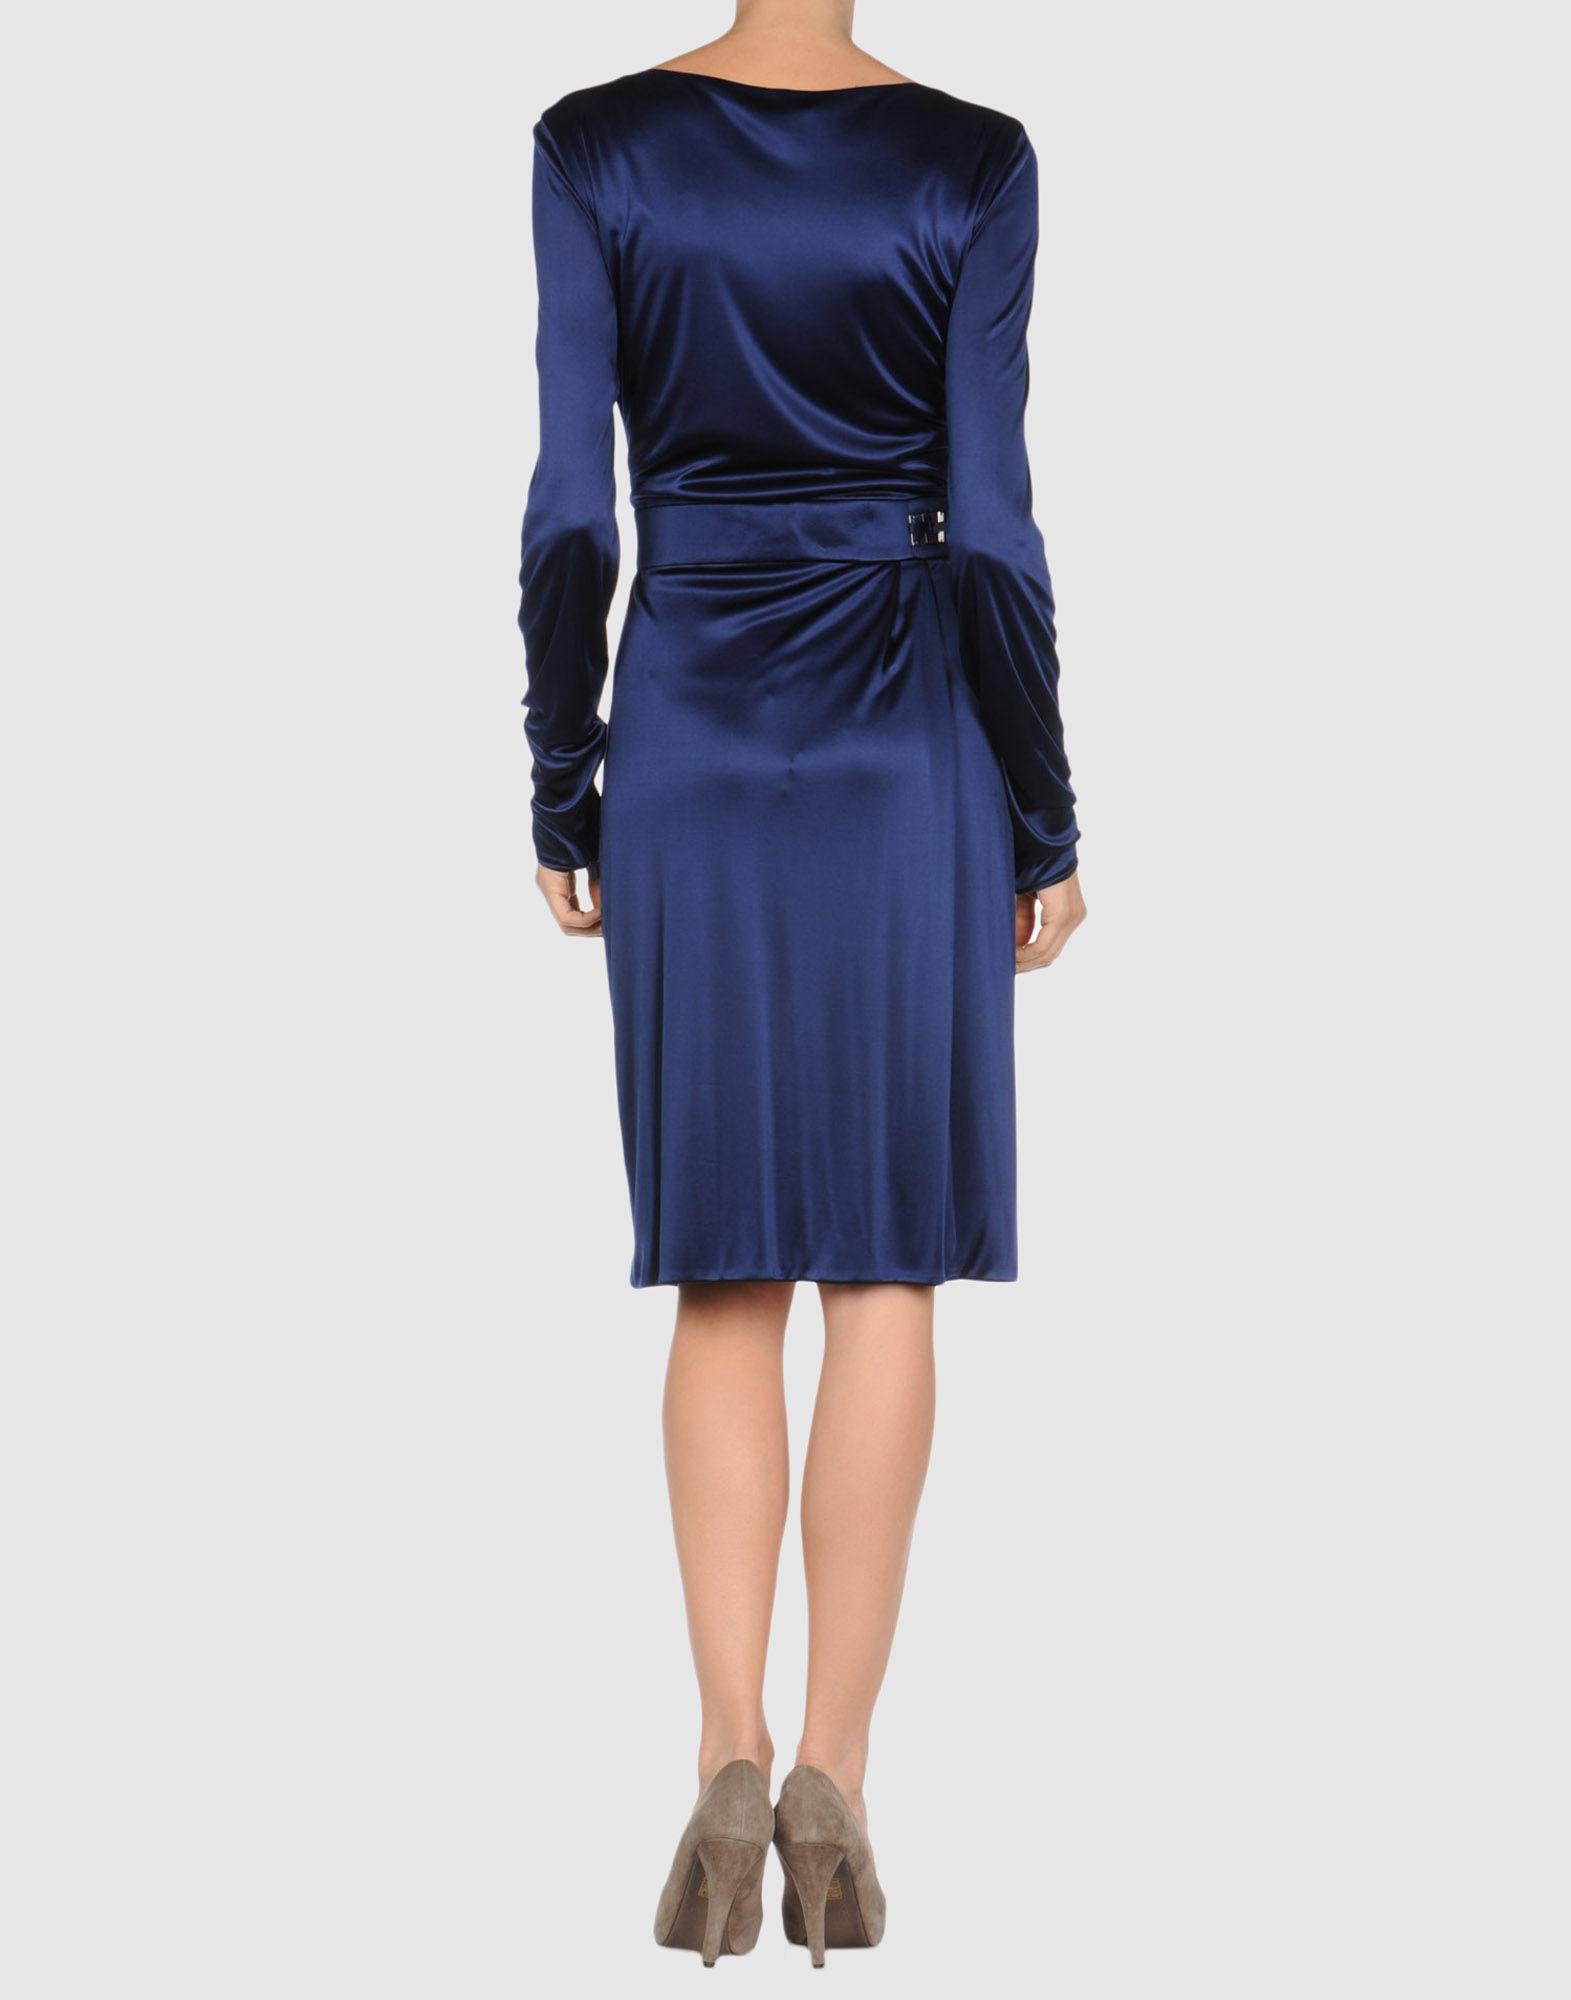 34225001HW 14 r - Evening Φορεματα Versace 2011 2012 Κωδ.21